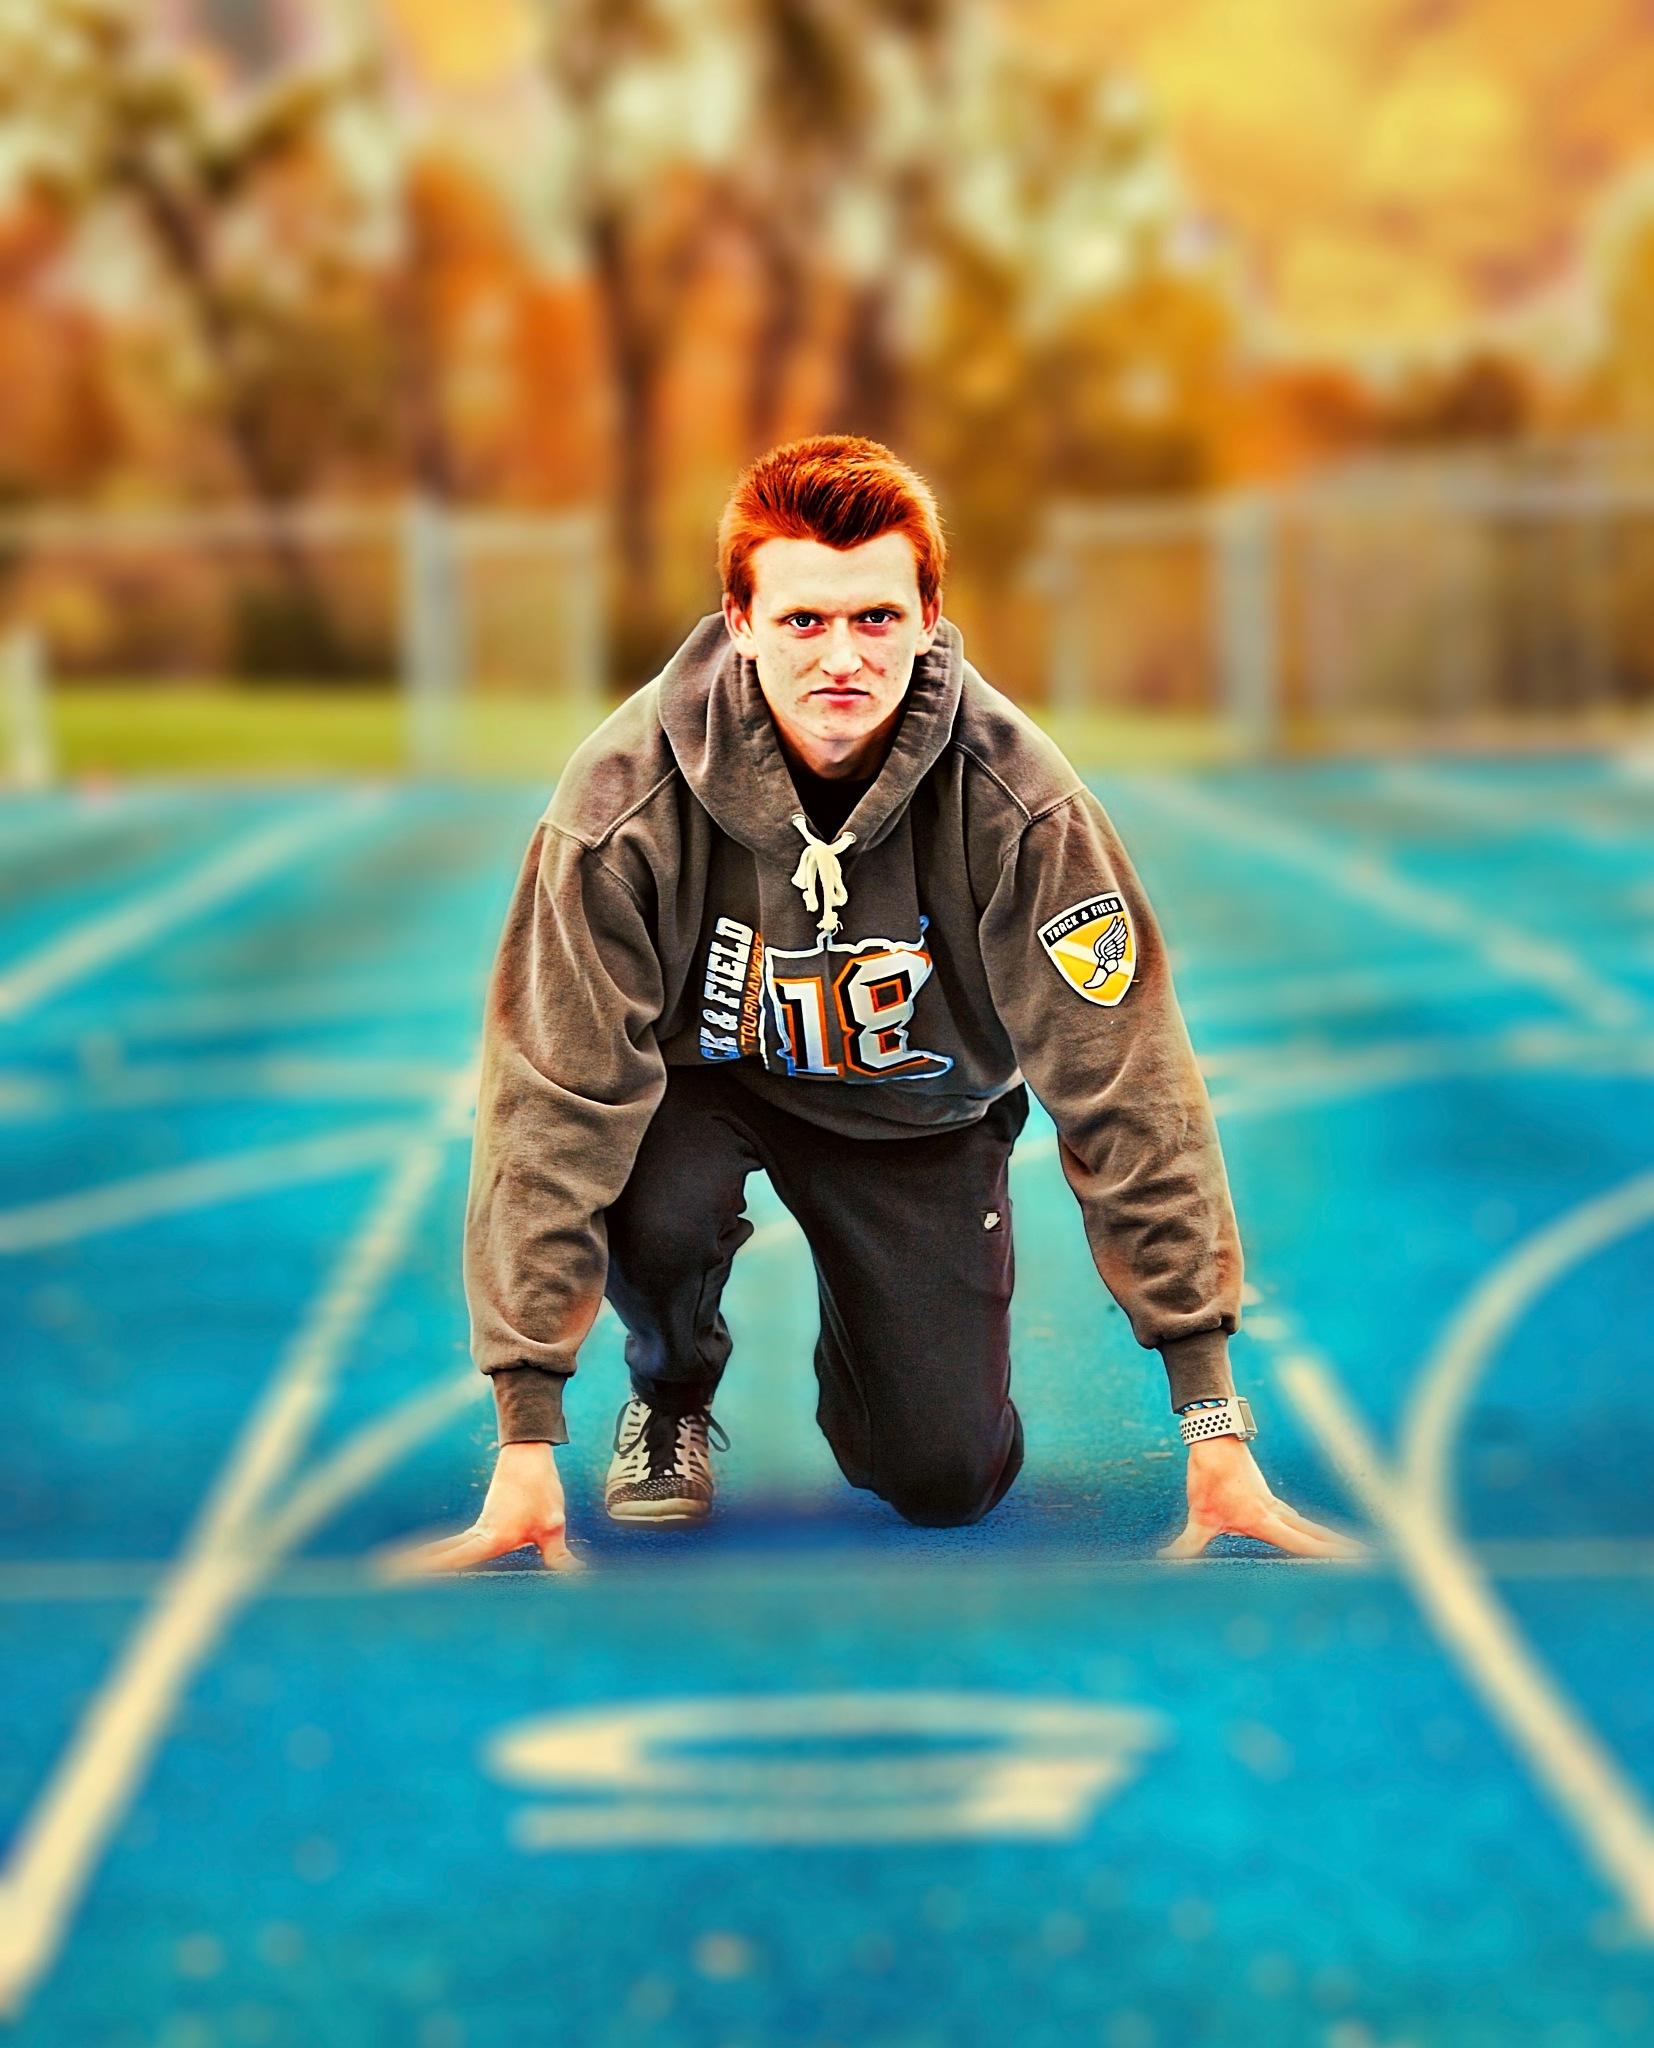 Senior shoot track star by Randy J Smith Photography